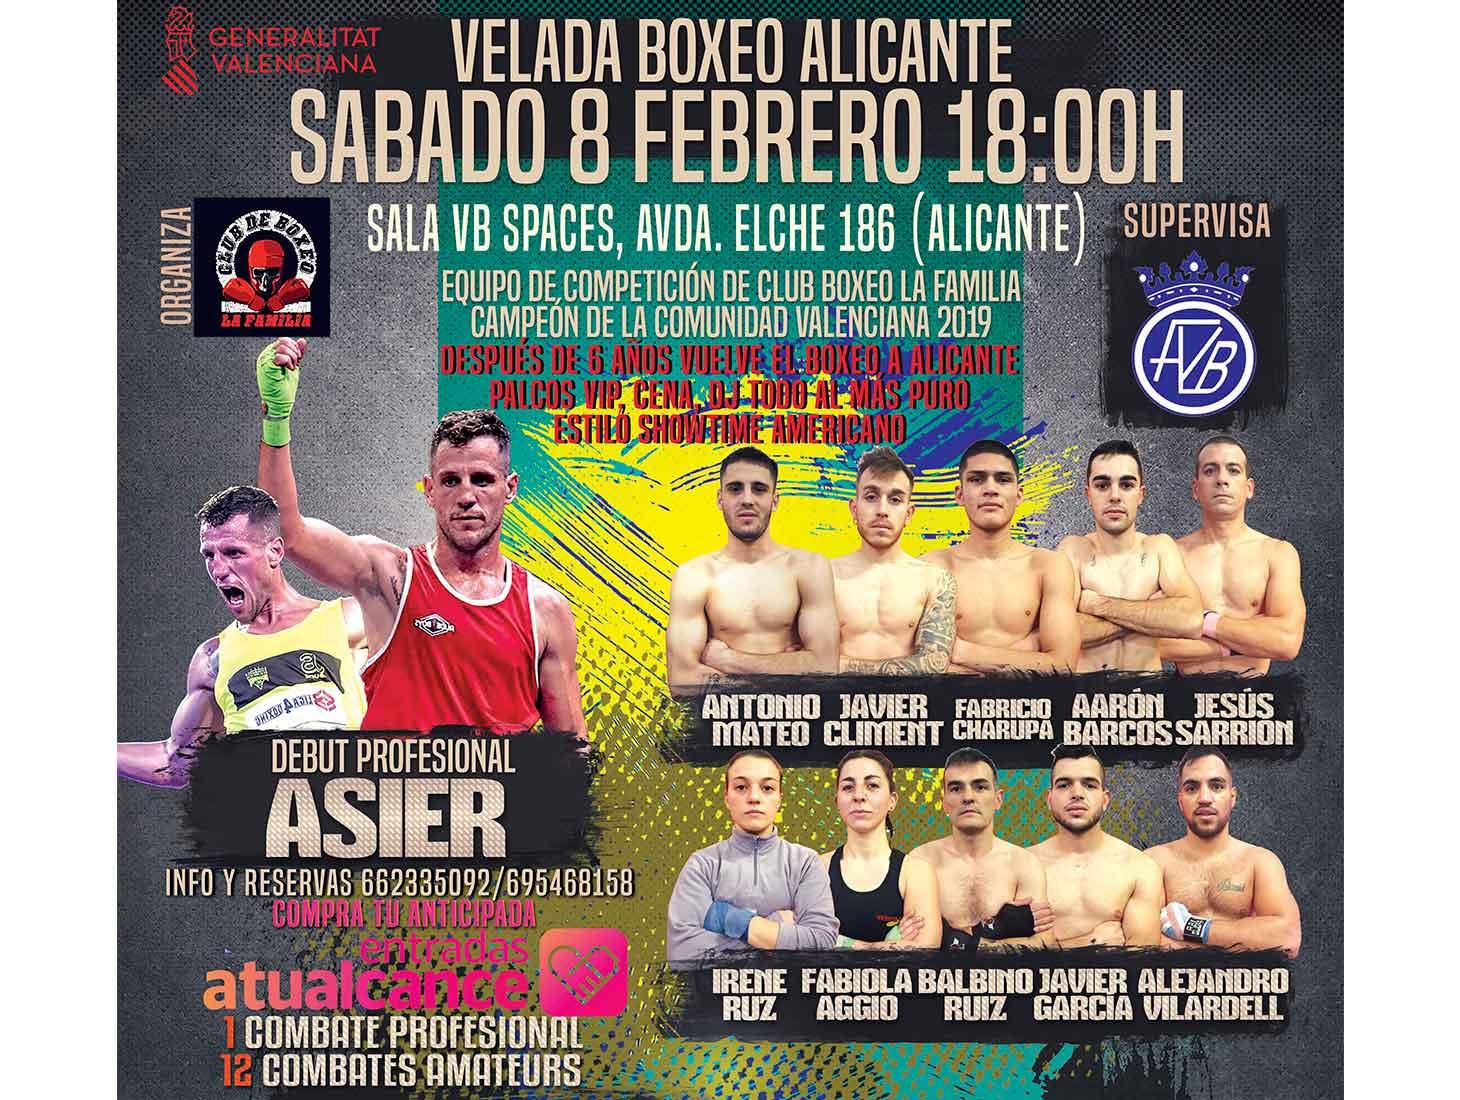 velada-boxeo-en-vb-spaces-8-febrero-2020-5e15cce248fc1.jpeg